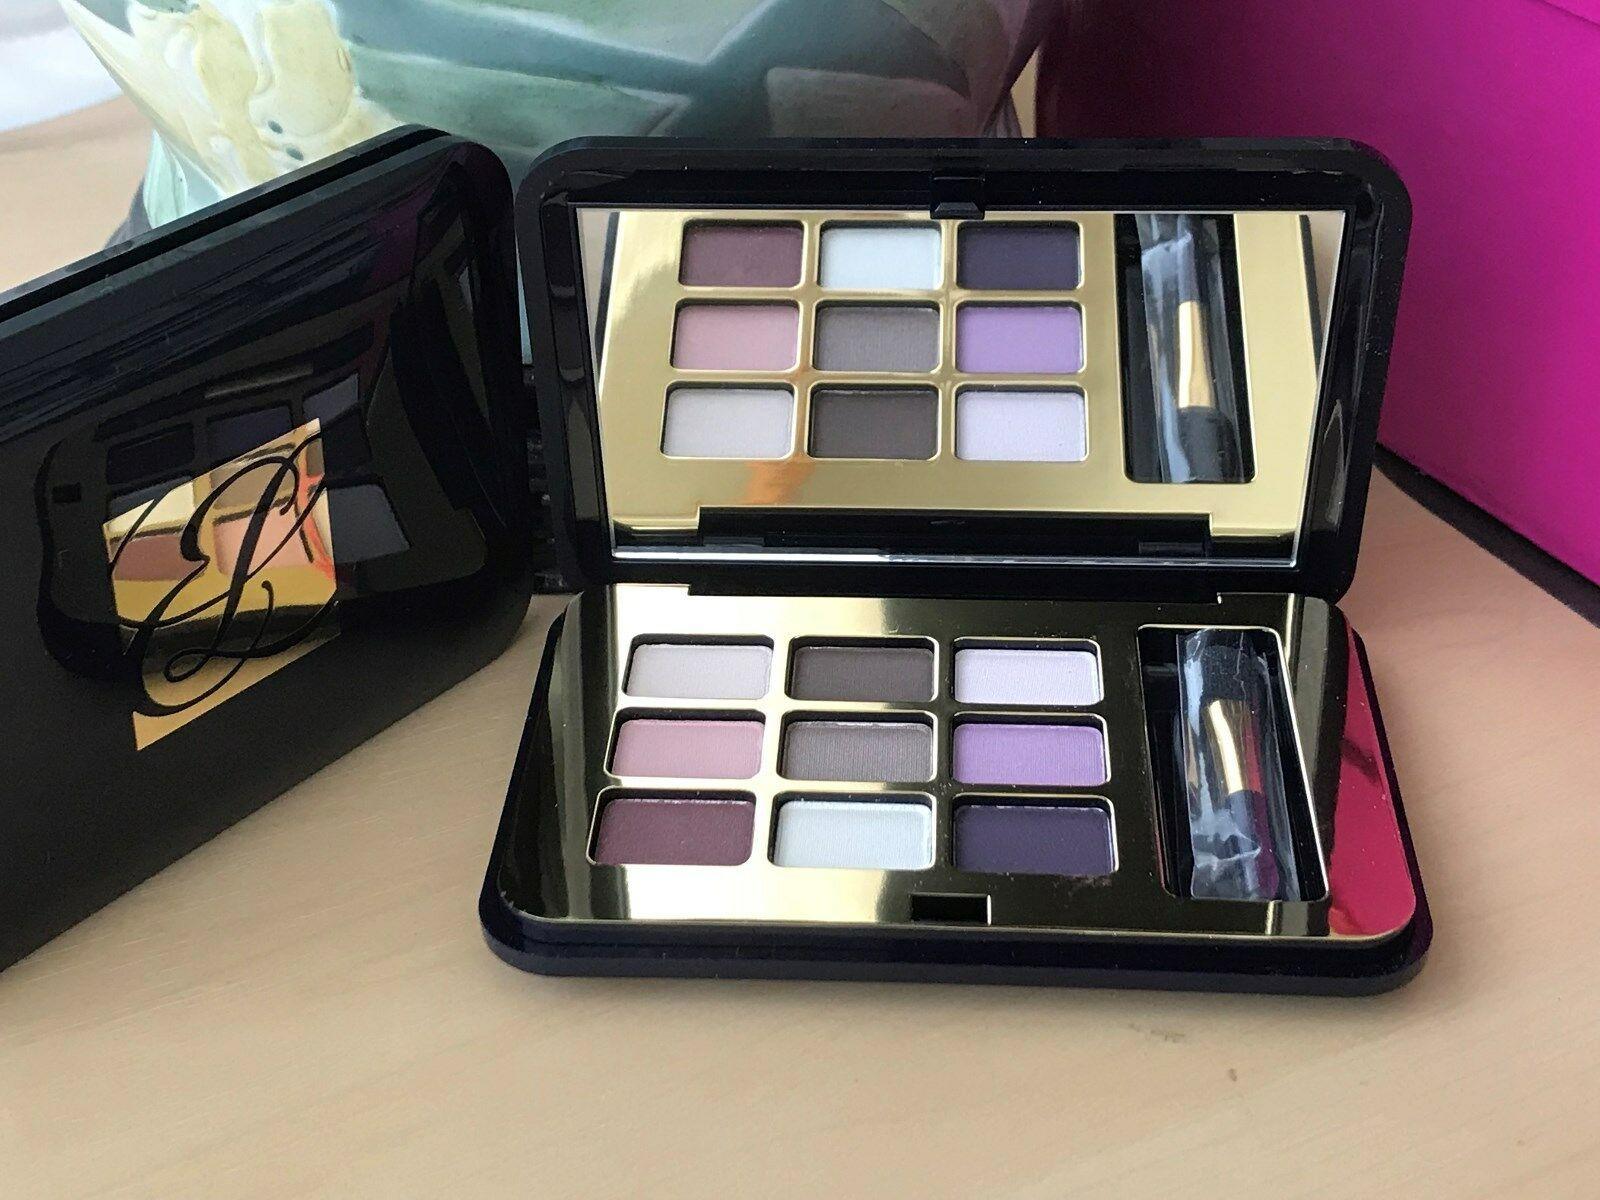 Estee Lauder Signature 9 Eyeshadow Palette Sand Smoky Pink Arctic Night Blue Smo - $22.28